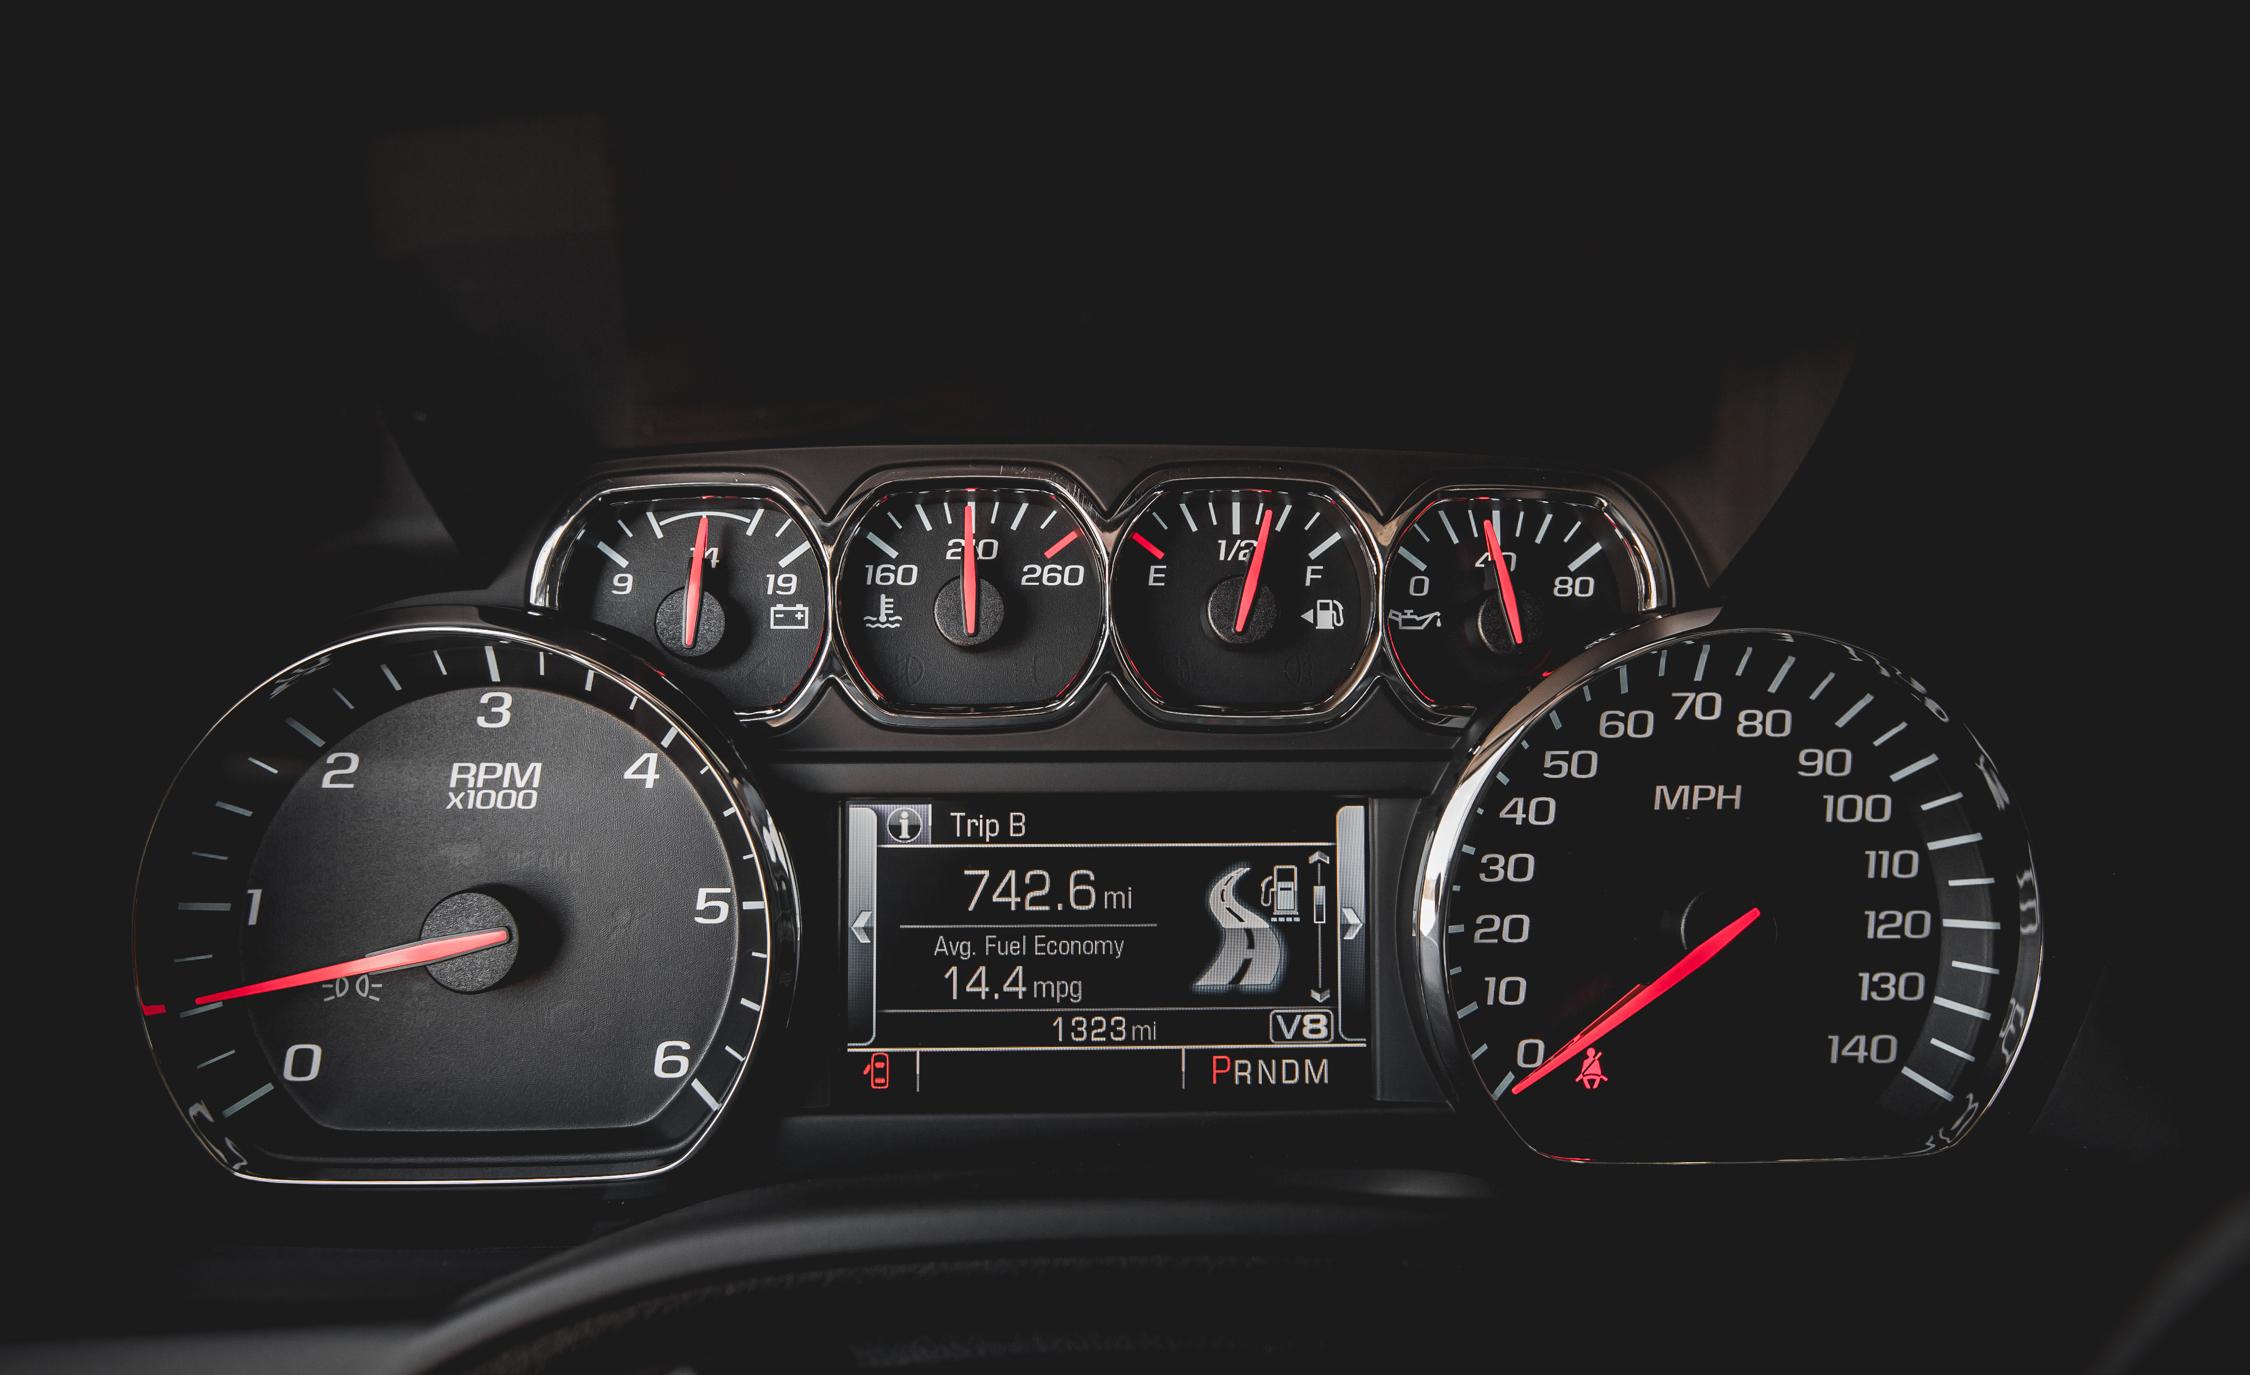 2015 Chevrolet Suburban LTZ Interior Speedometer